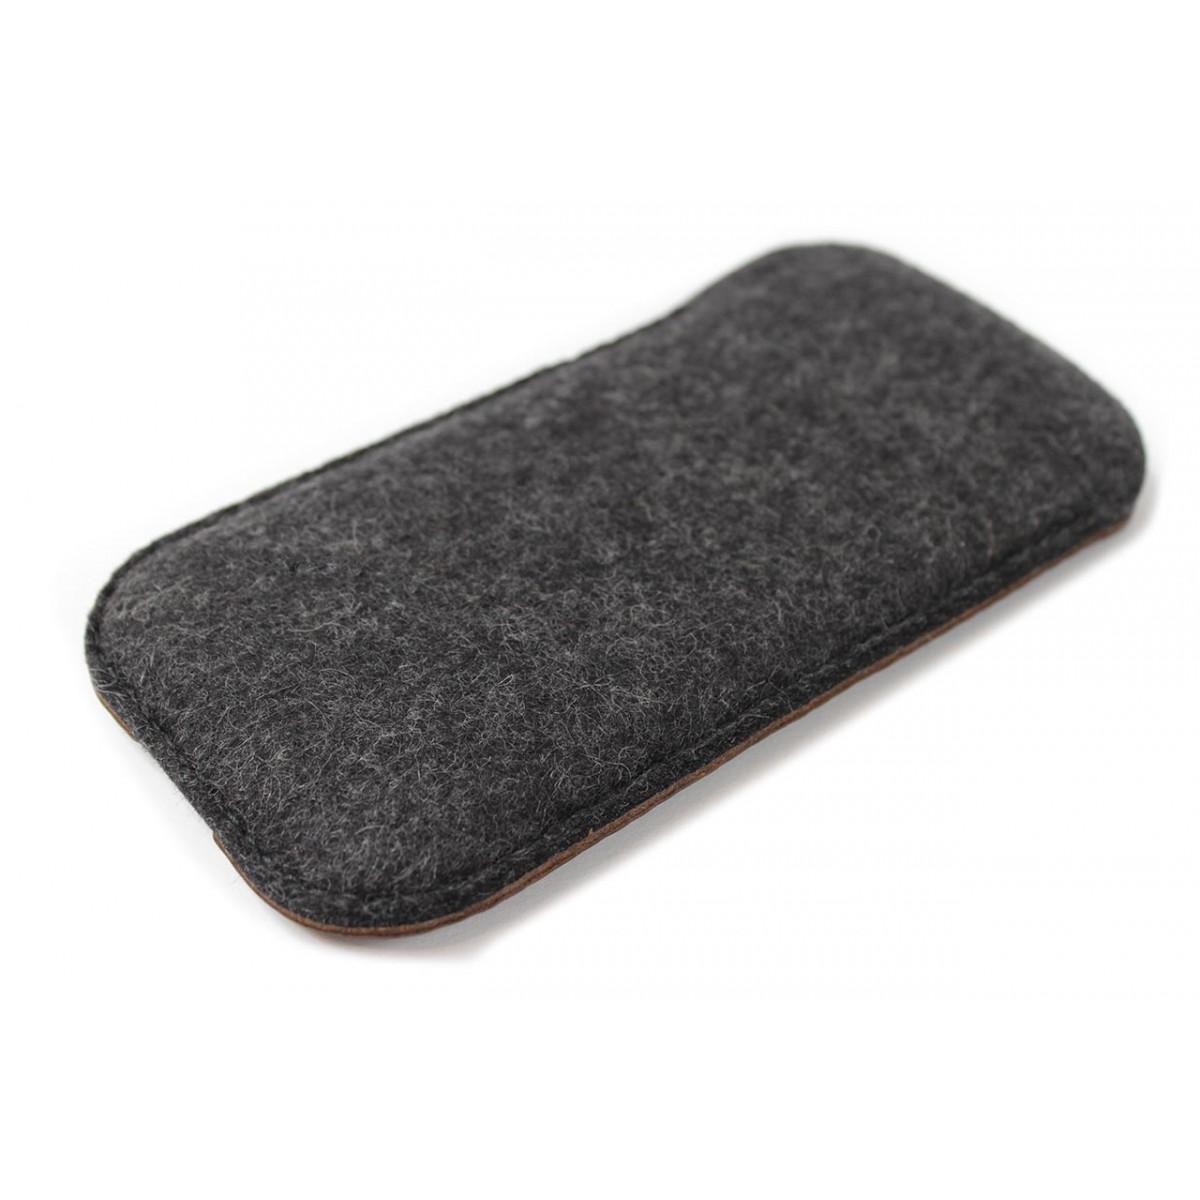 iPhone 7 / 6S Hülle KINGSTON Pflanzlich gegerbtes Leder, 100% Wollfilz